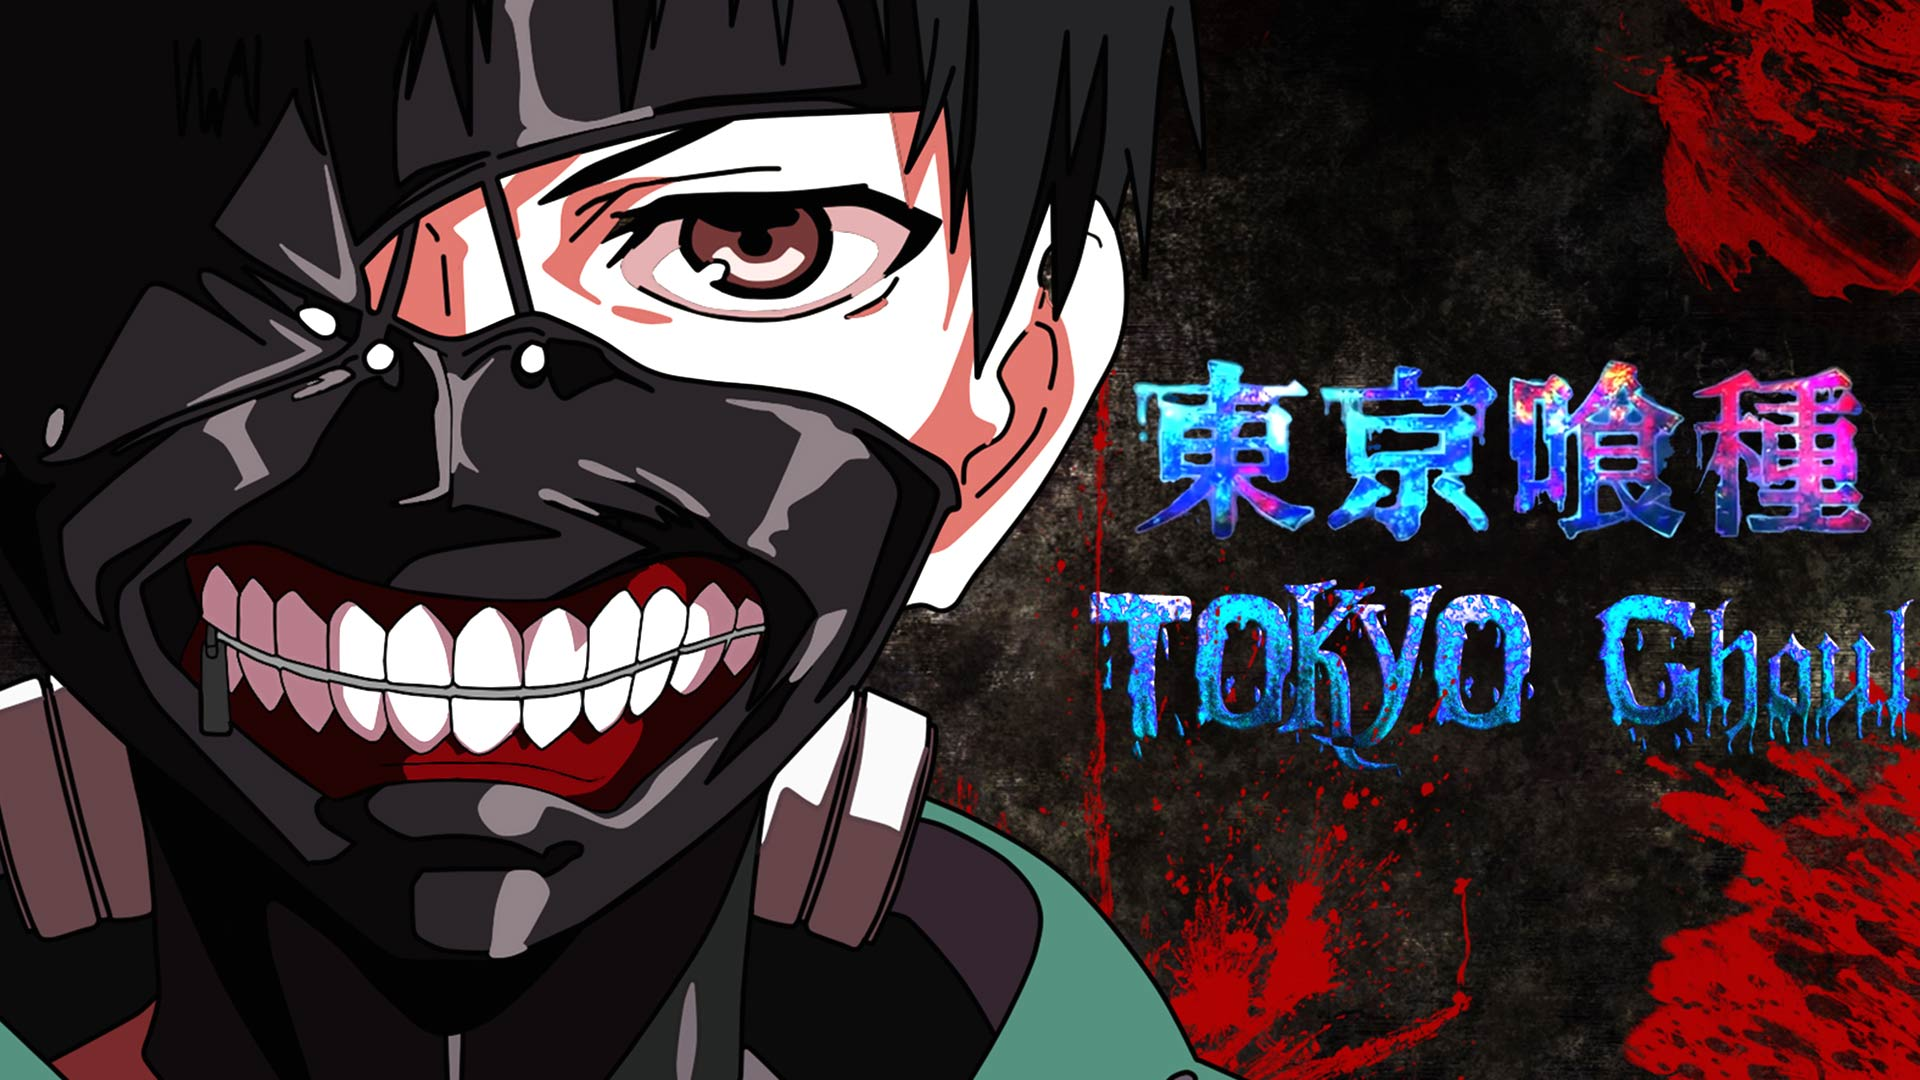 Tokyo Ghoul wallpapers full hd wallpapers for 1080p desktop 1920x1080